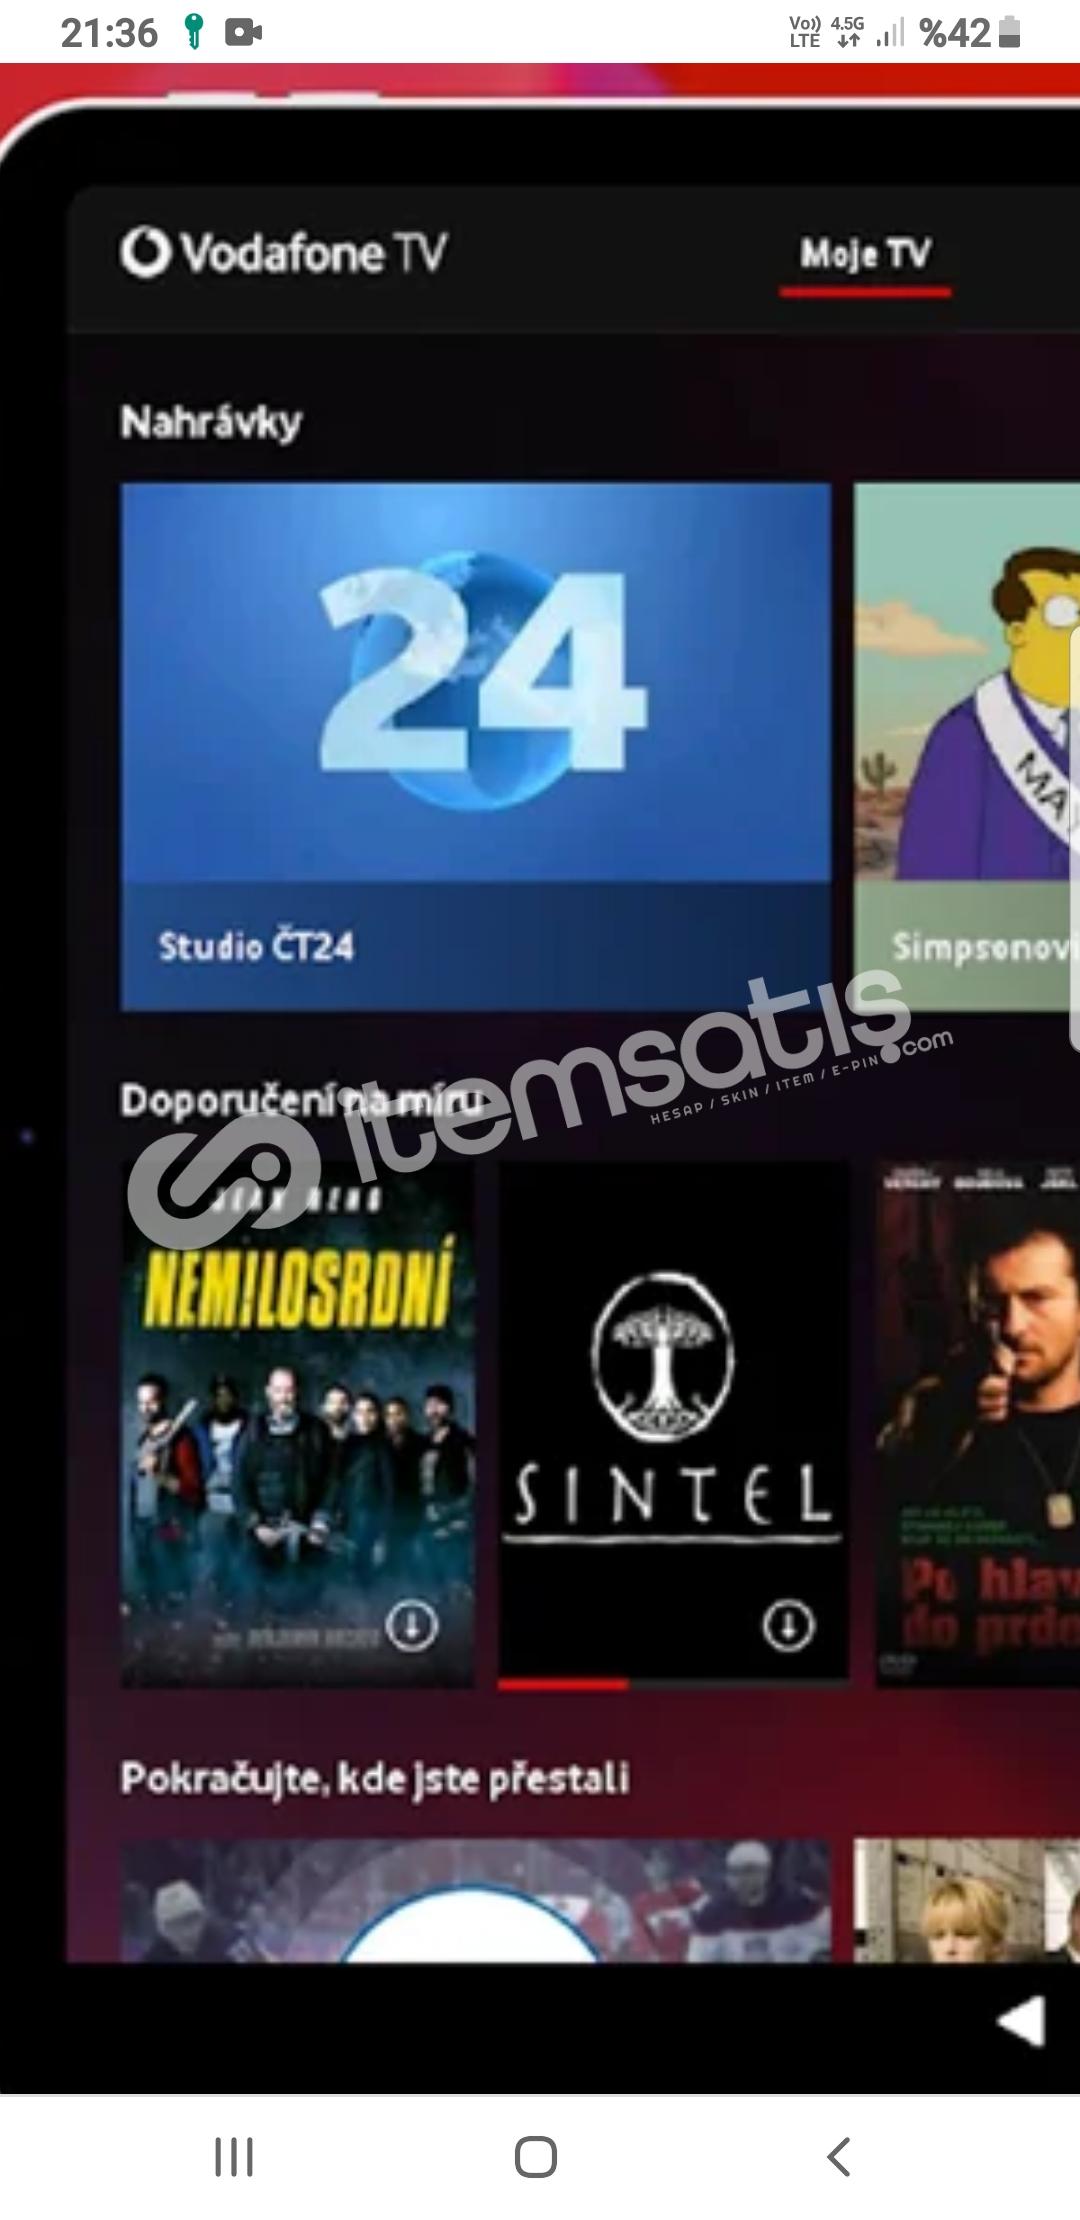 VADOFONE TV FULL PAKET 1 AYLIK 3 AYLIK